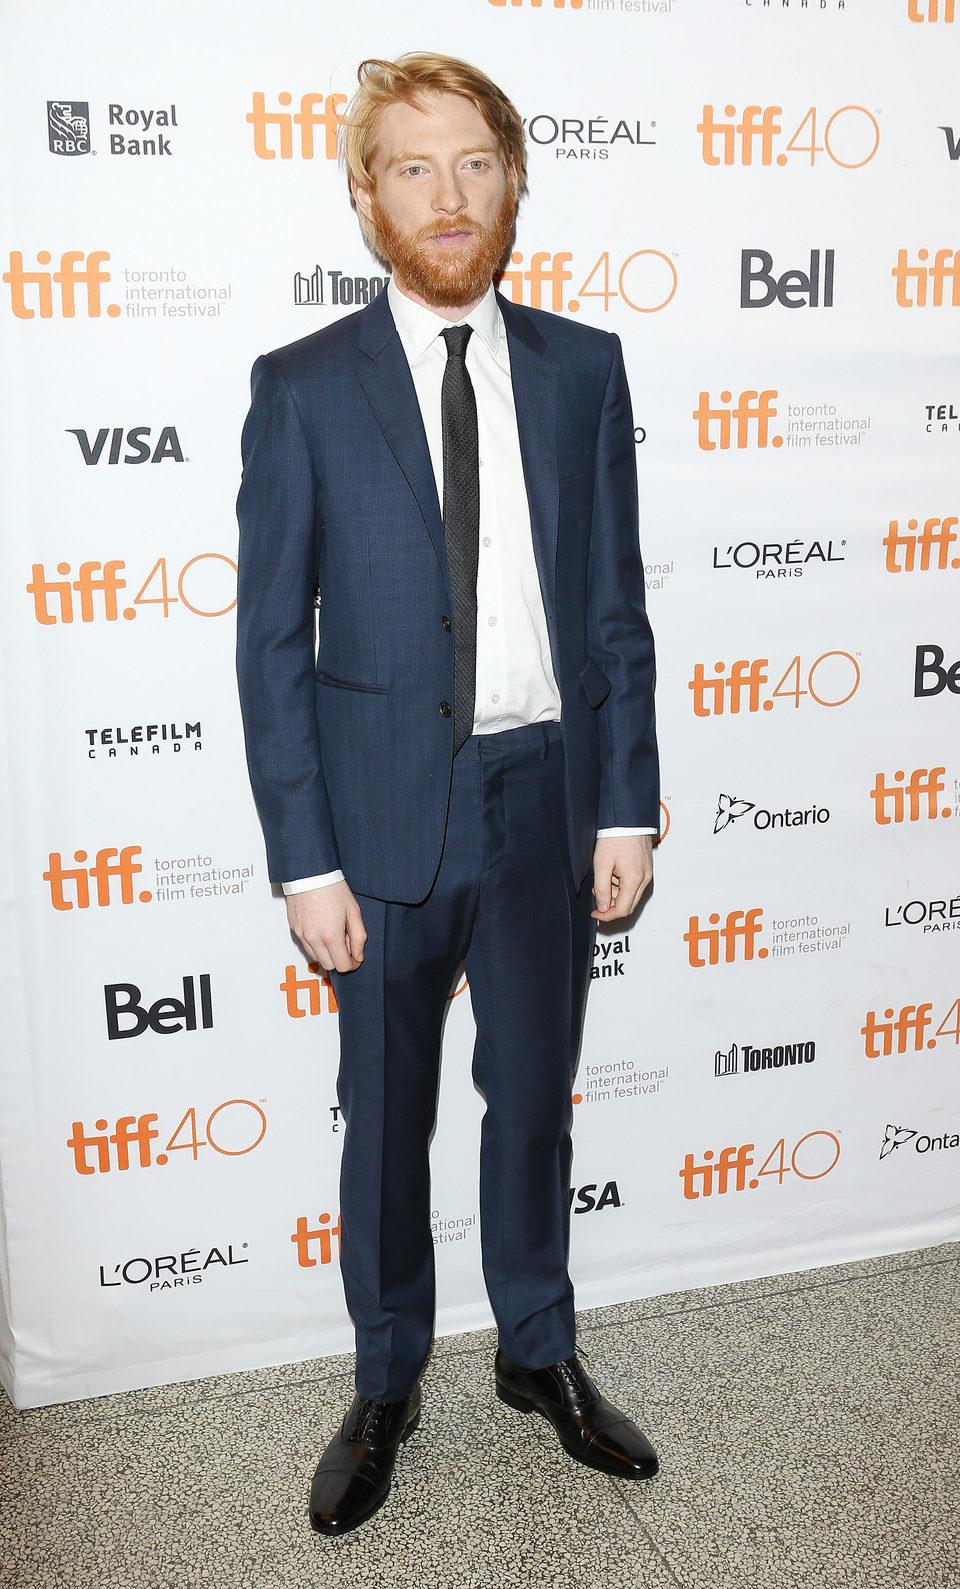 Domnhnall Gleeson at the Toronto International Film Festival 2015